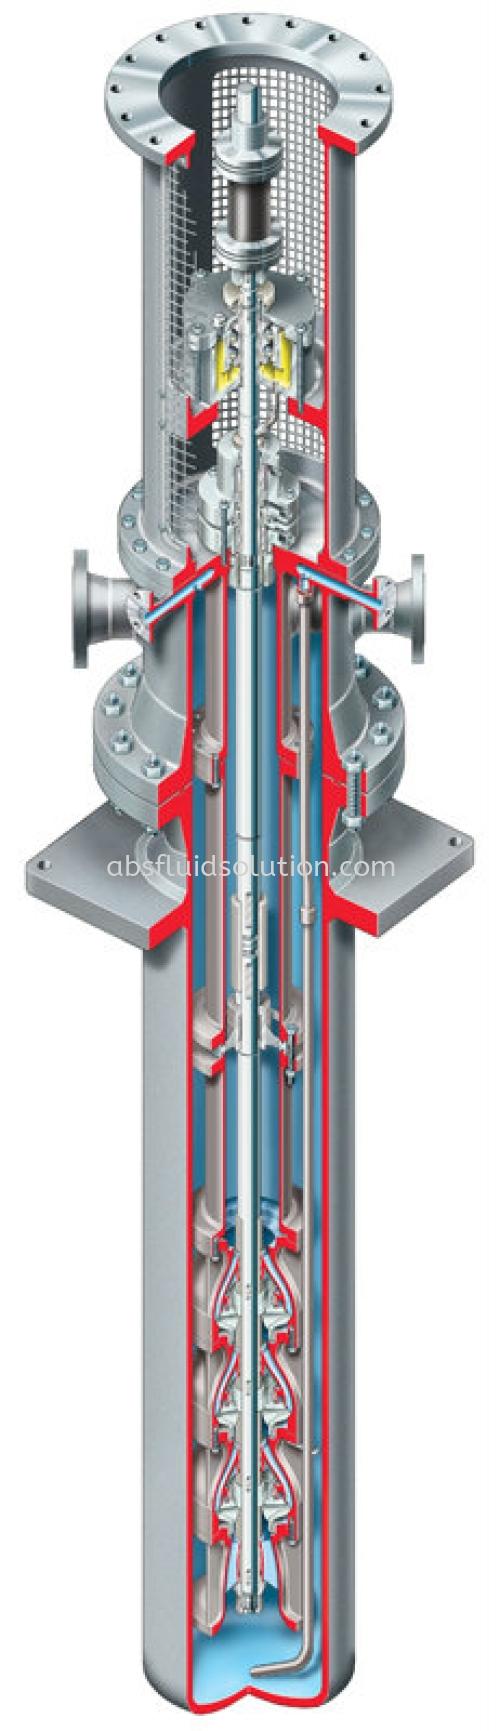 WUC ISO 13709/API 610 (VS6) Vertical, Double Case, Multistage Pump